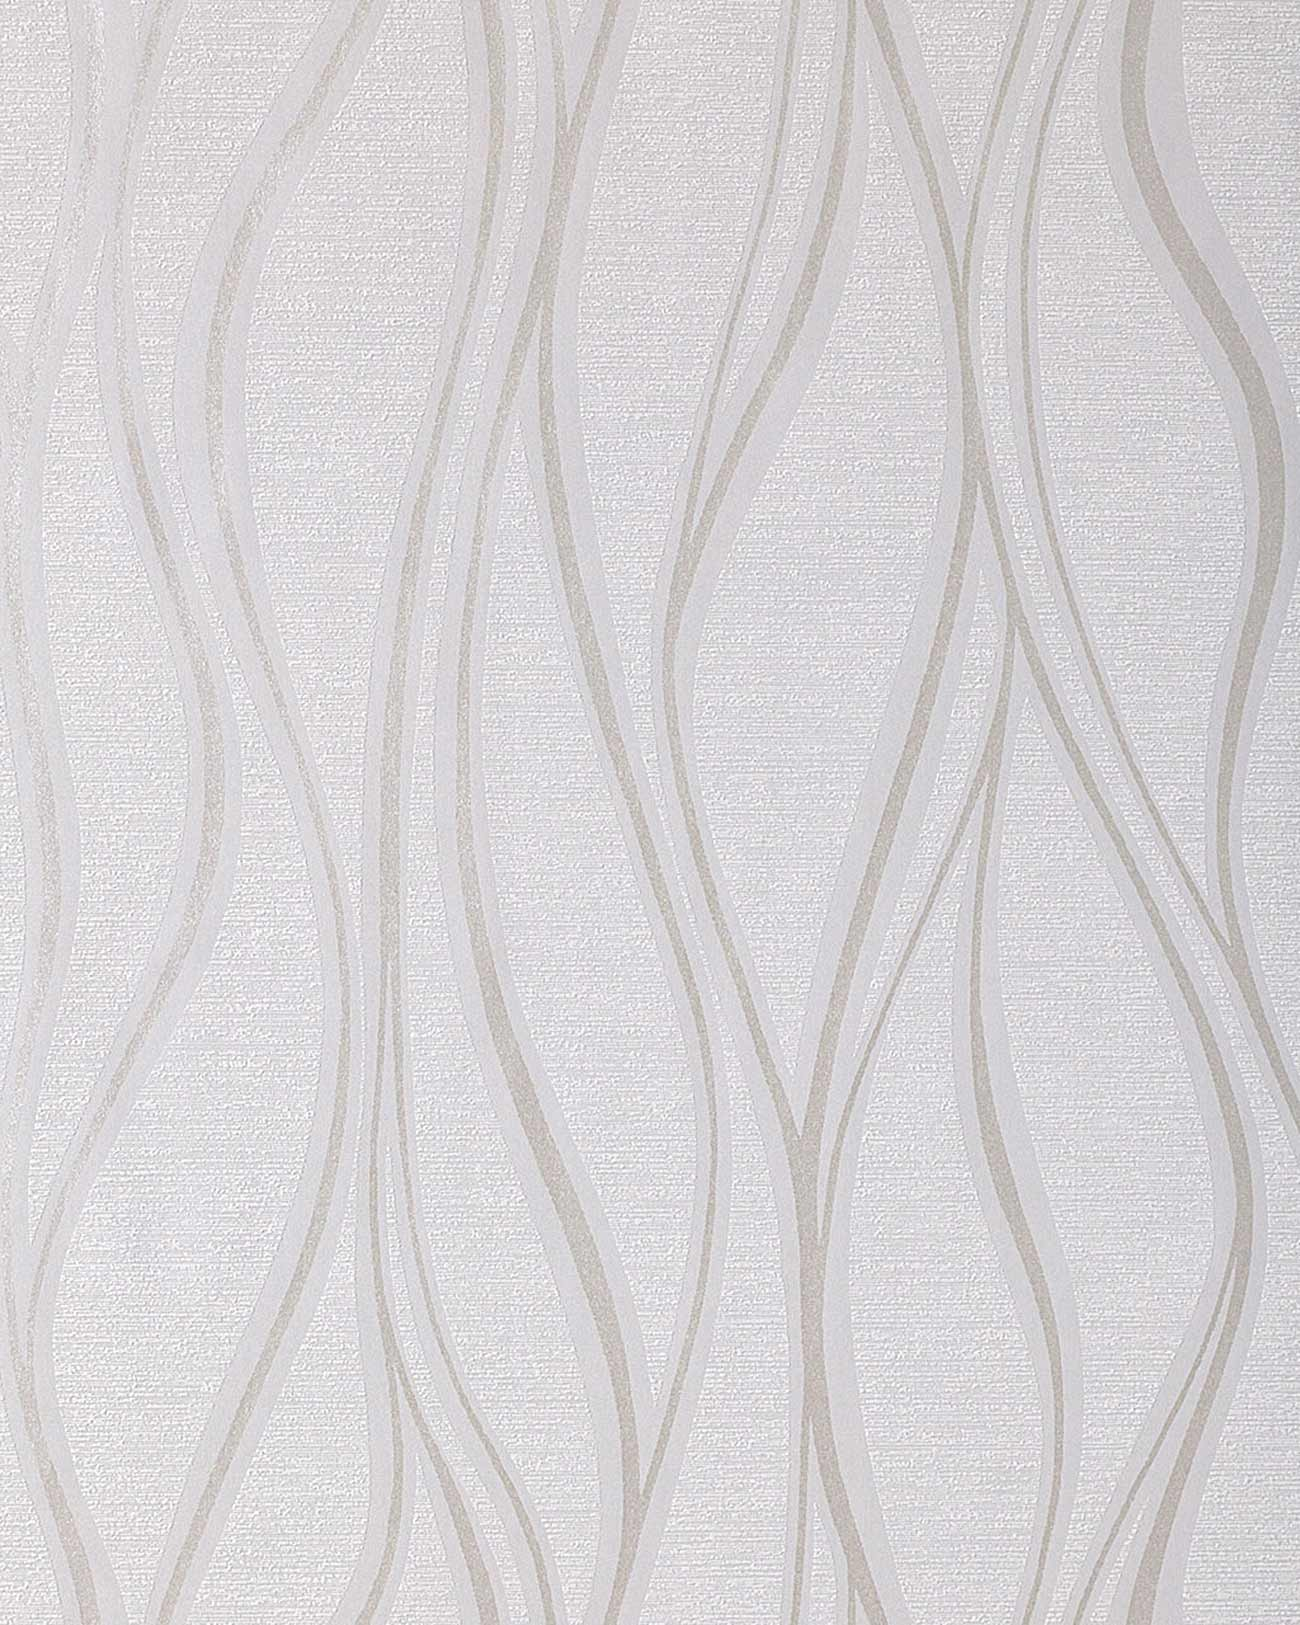 Stripe Vinyl Wallpaper Wall EDEM 147 02 Light Grey White Silver 1300x1625